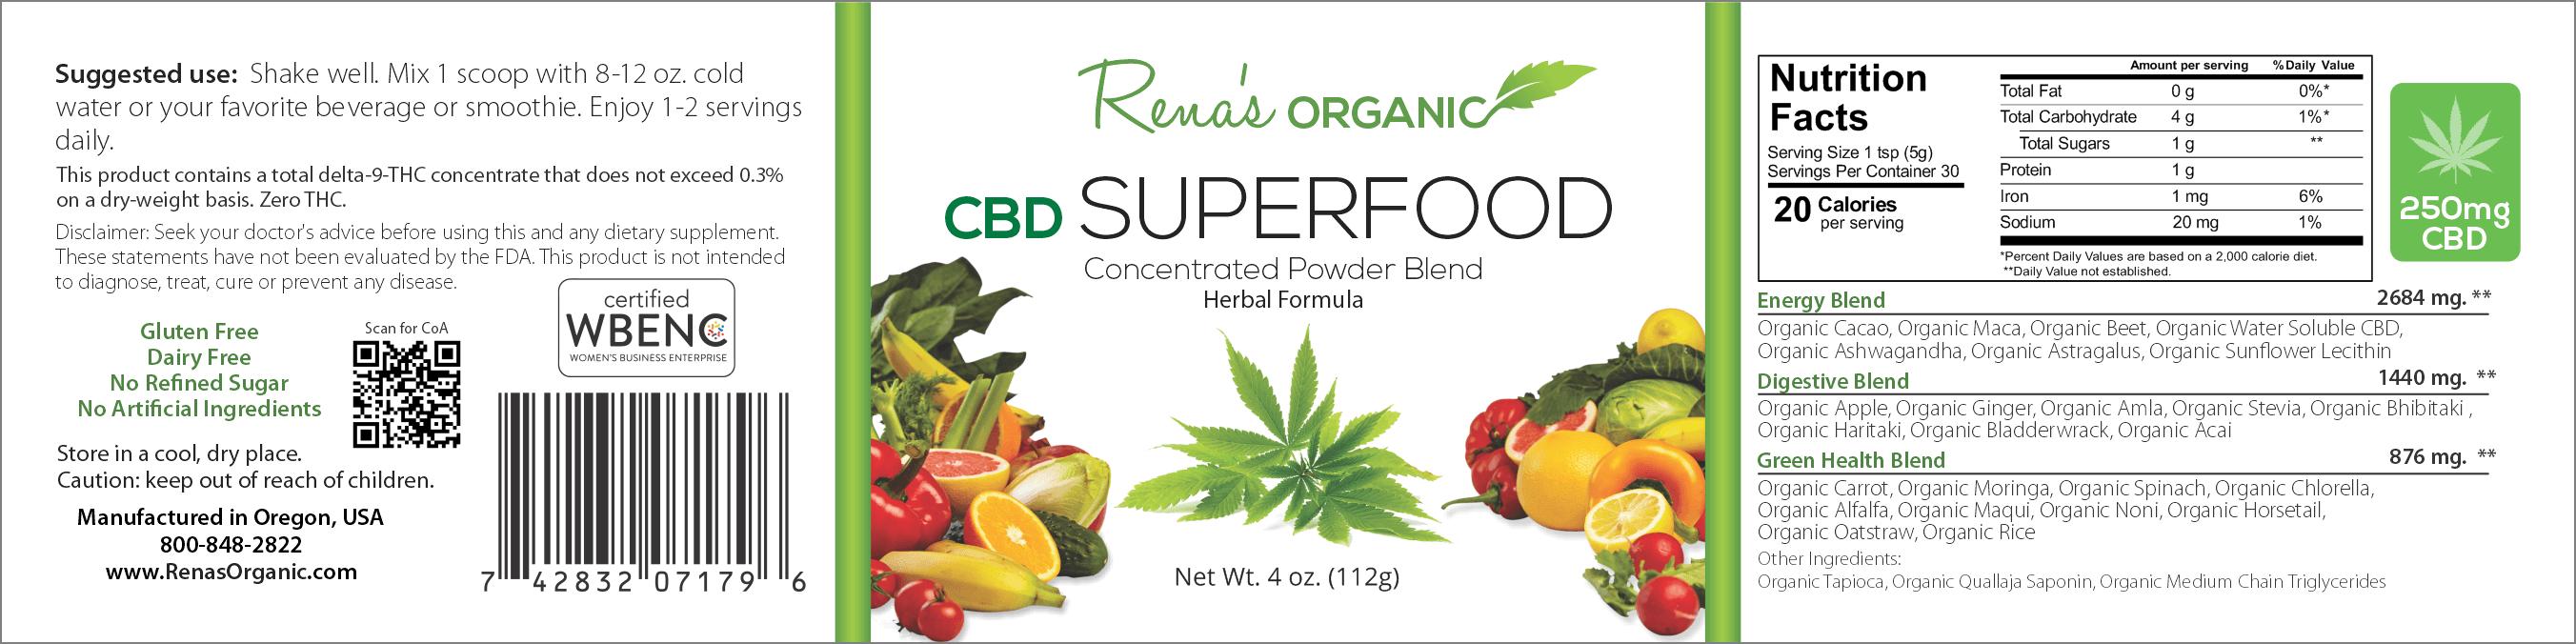 Rena's Organics also offers the best cbd cream on the market - cbd pain cream, cbd cream for back pain, cbd pain relief cream, cbd lotion for pain and Slender Cider on the market!